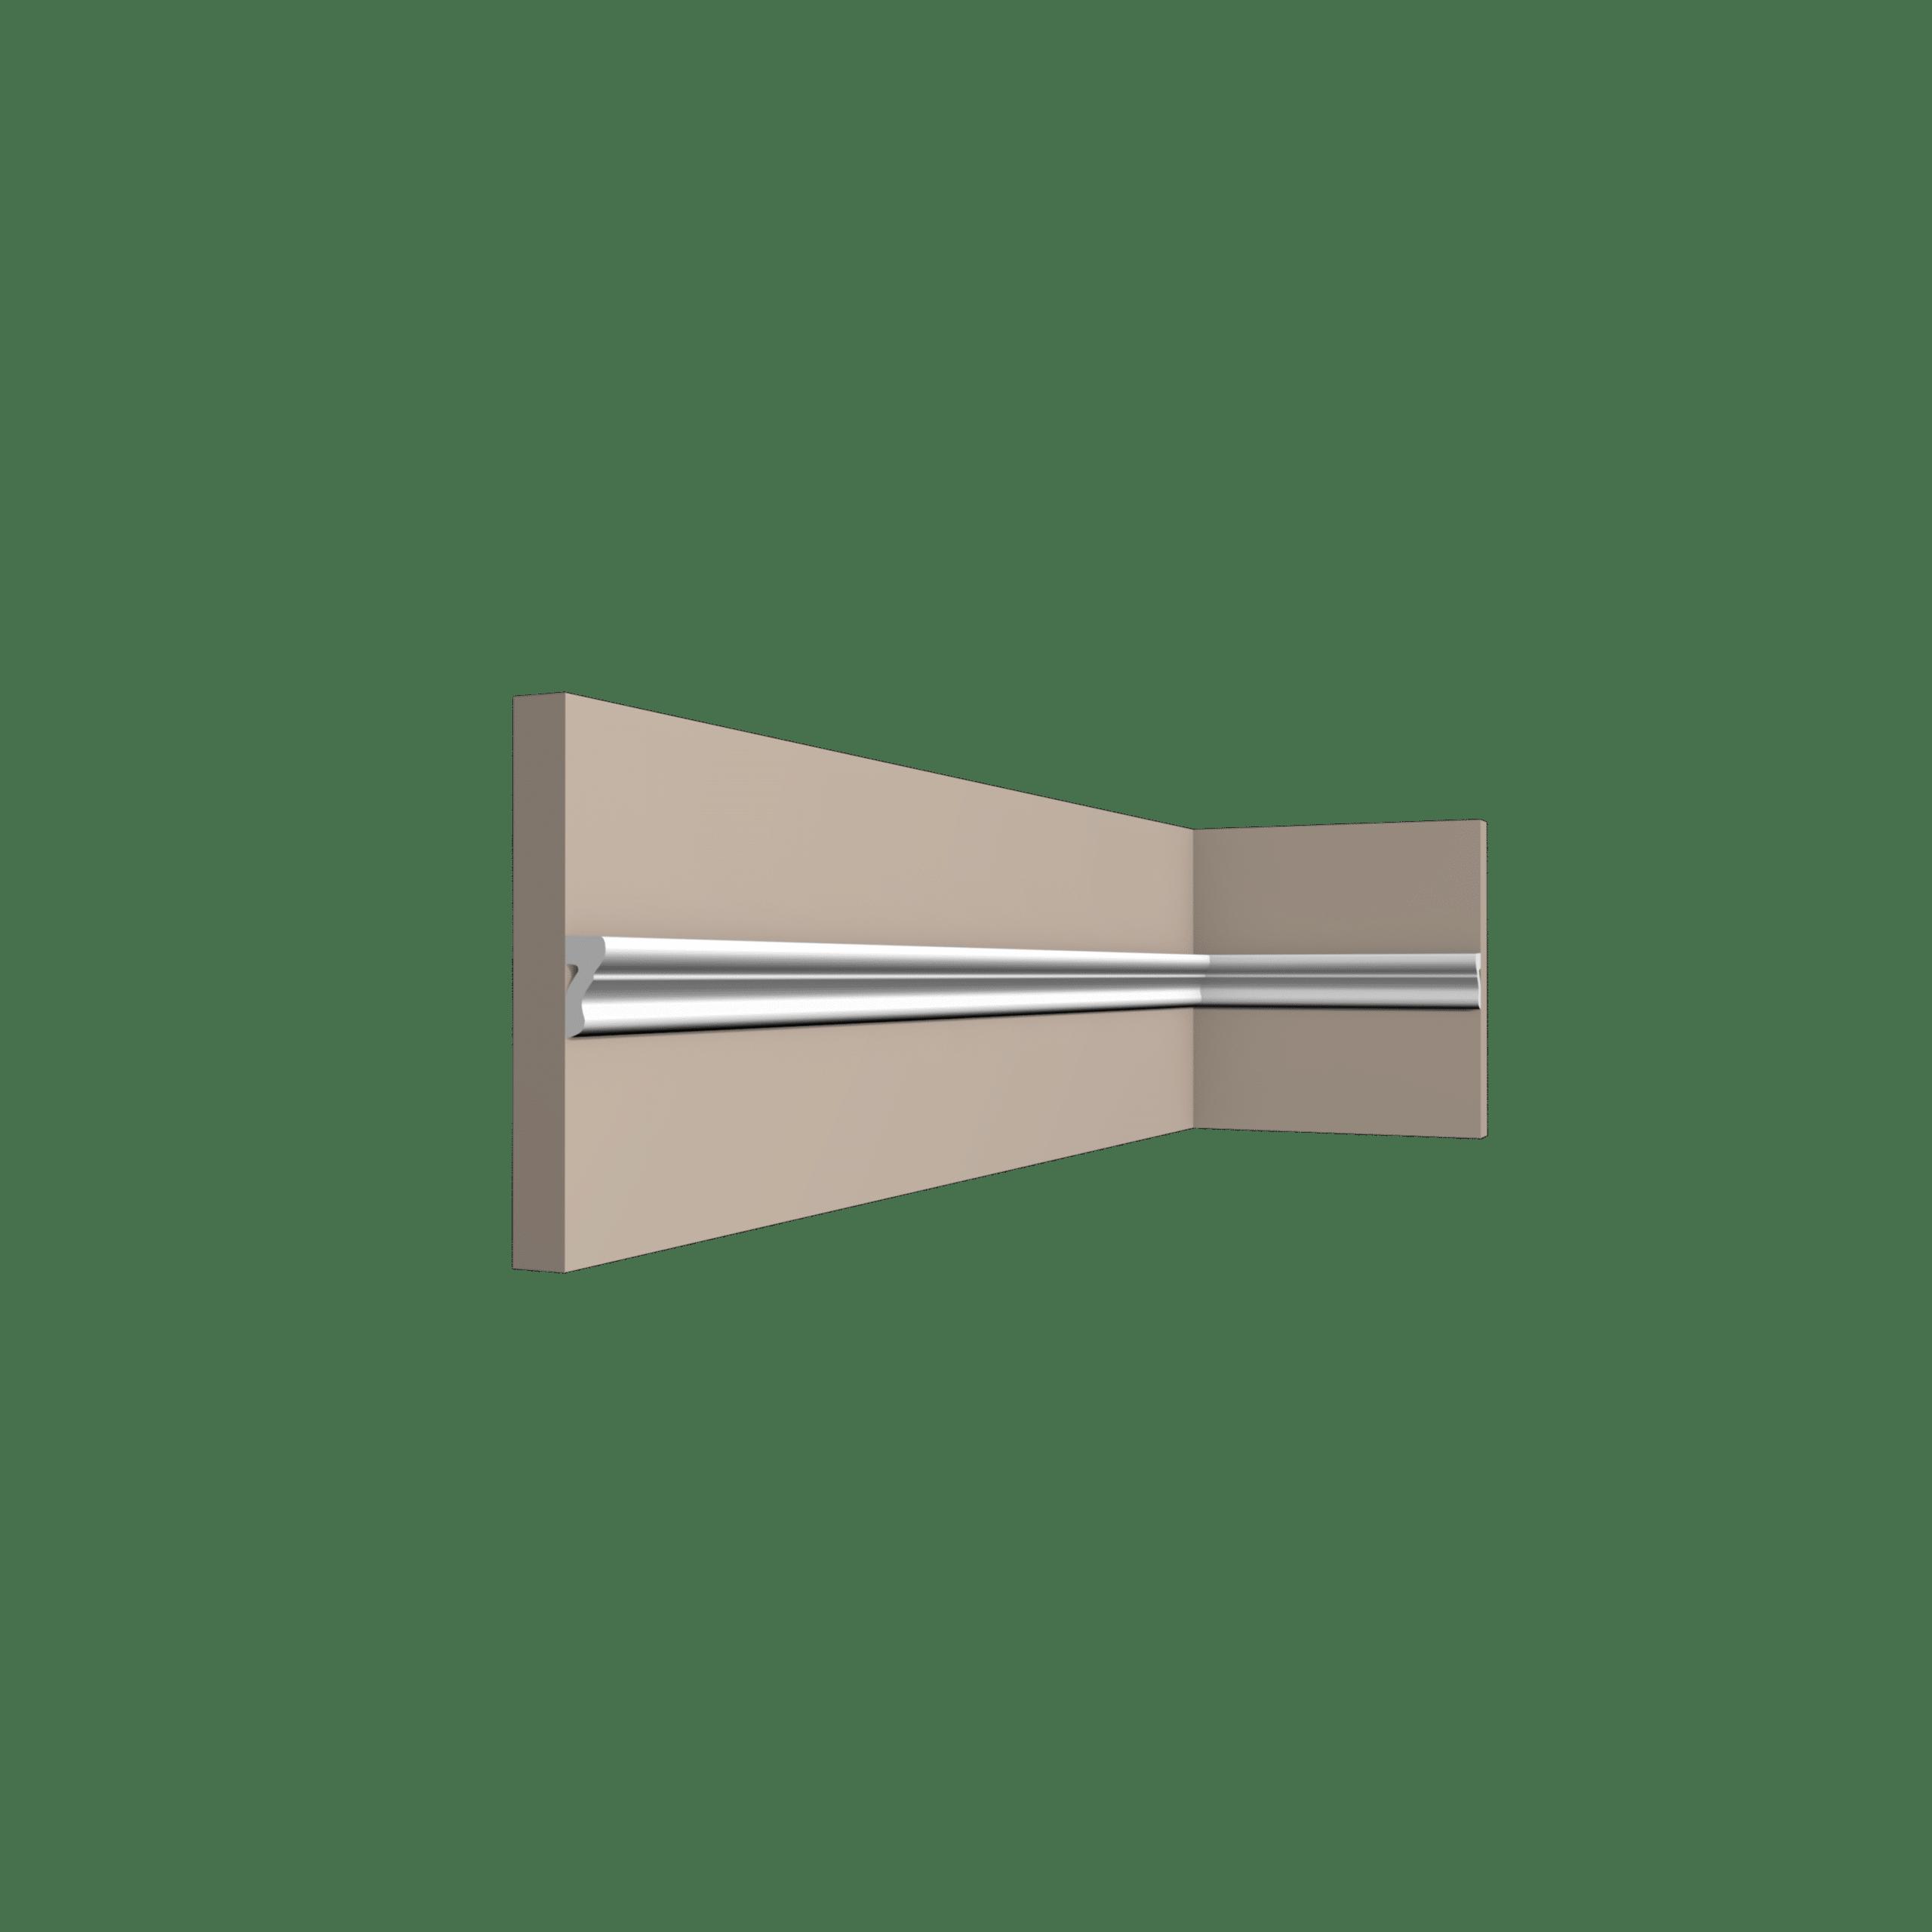 קרניז פוליאוריתן דגם DS - 2534